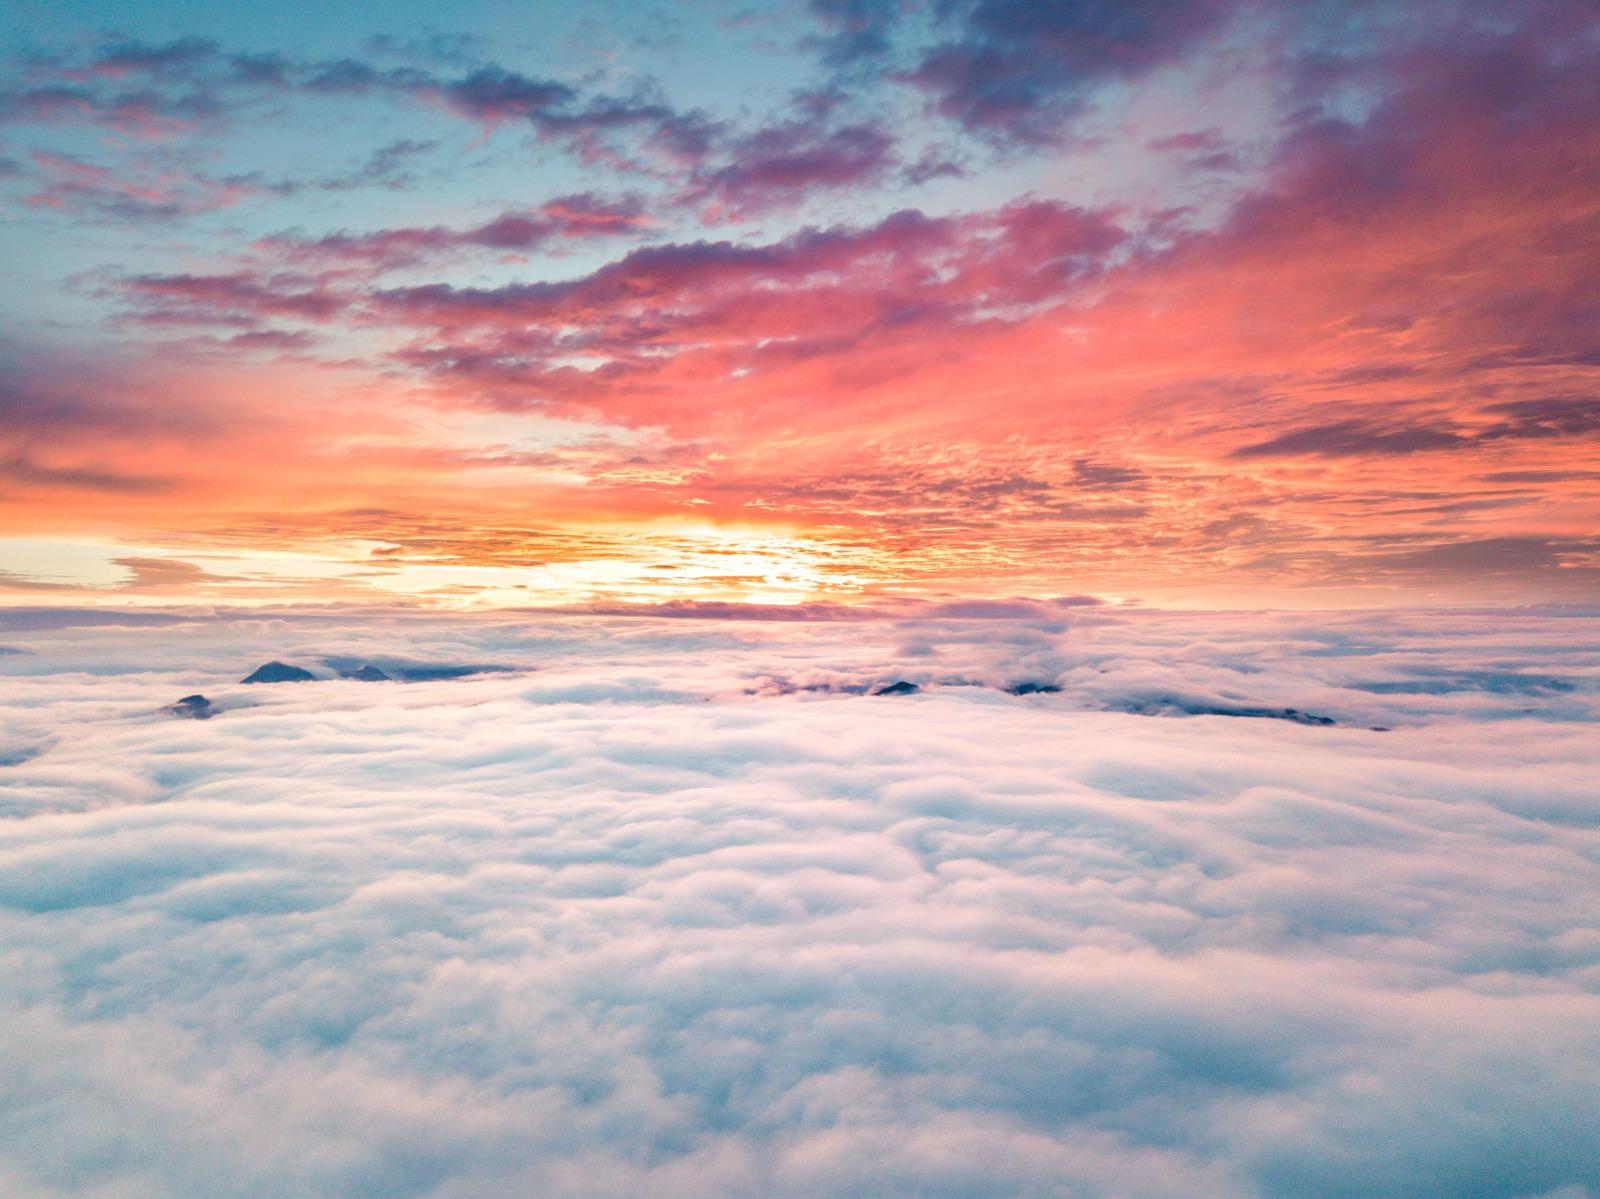 wolken cloud jerry zhang aQx1sz3cbpQ unsplash